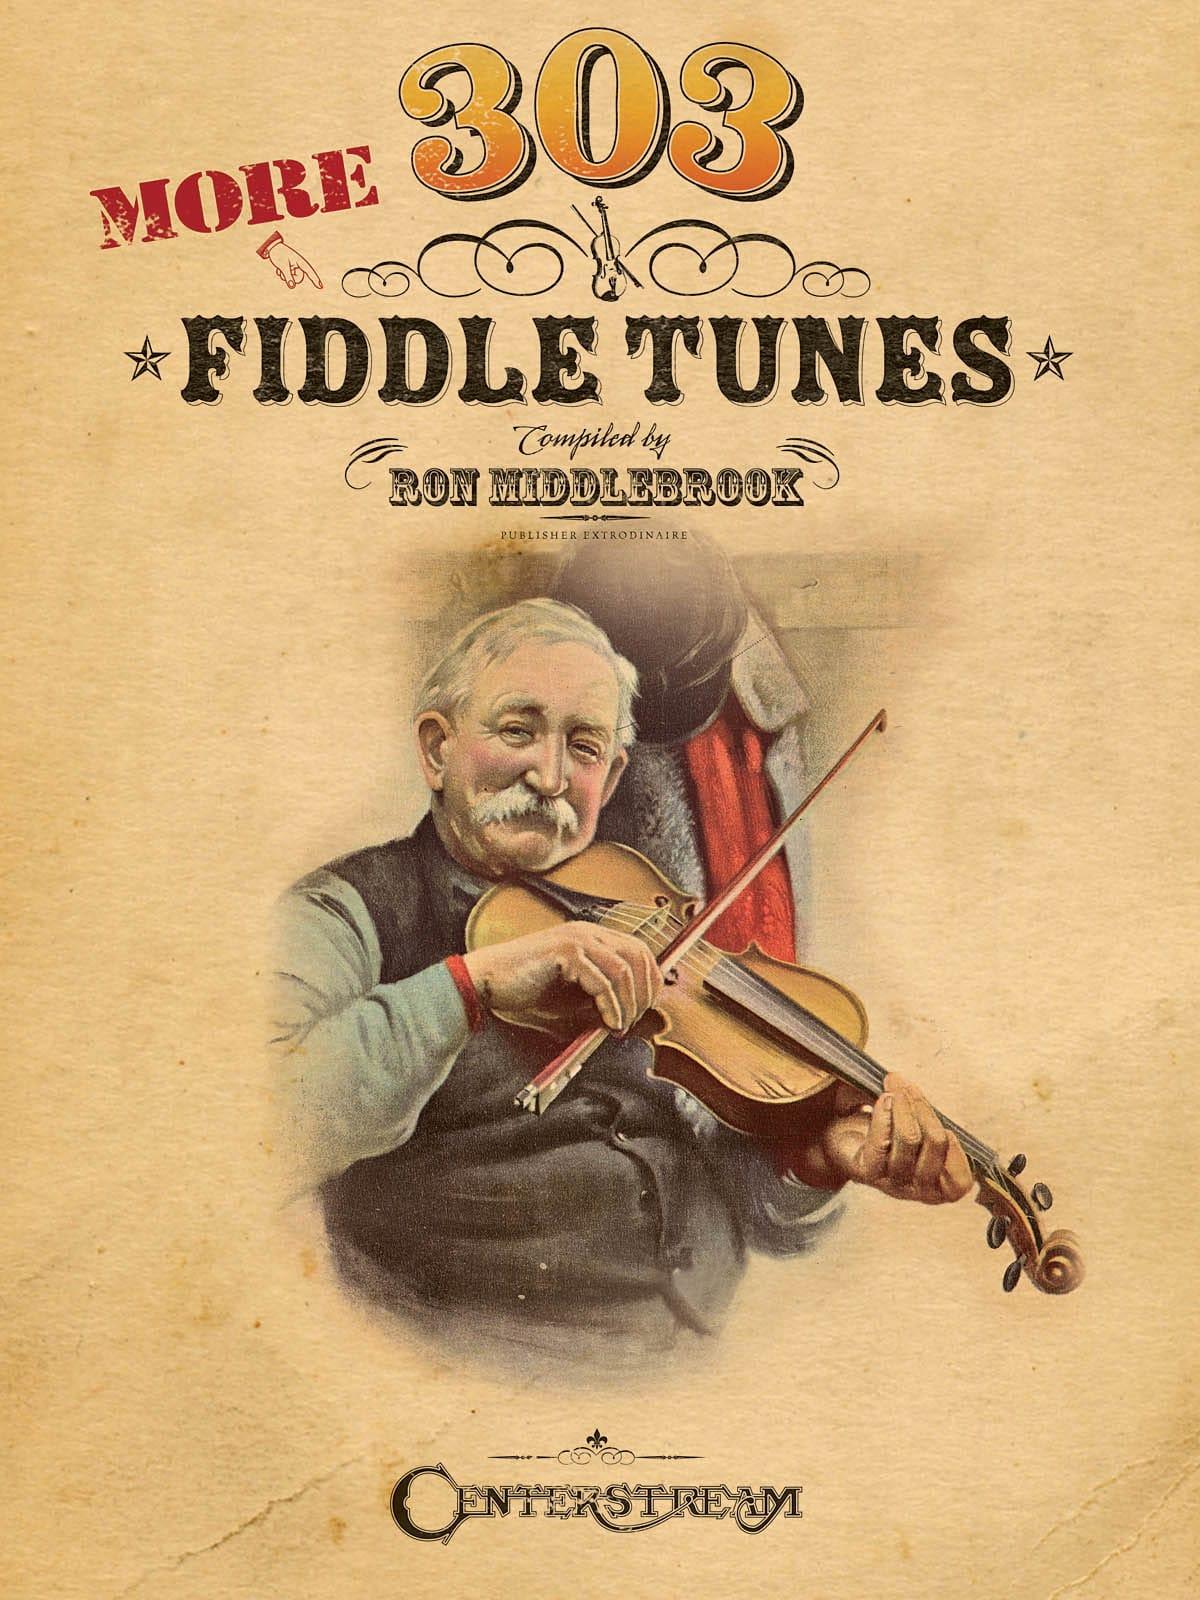 More 303 Fiddle Tunes - Ron Middlebrook - Partition - laflutedepan.com